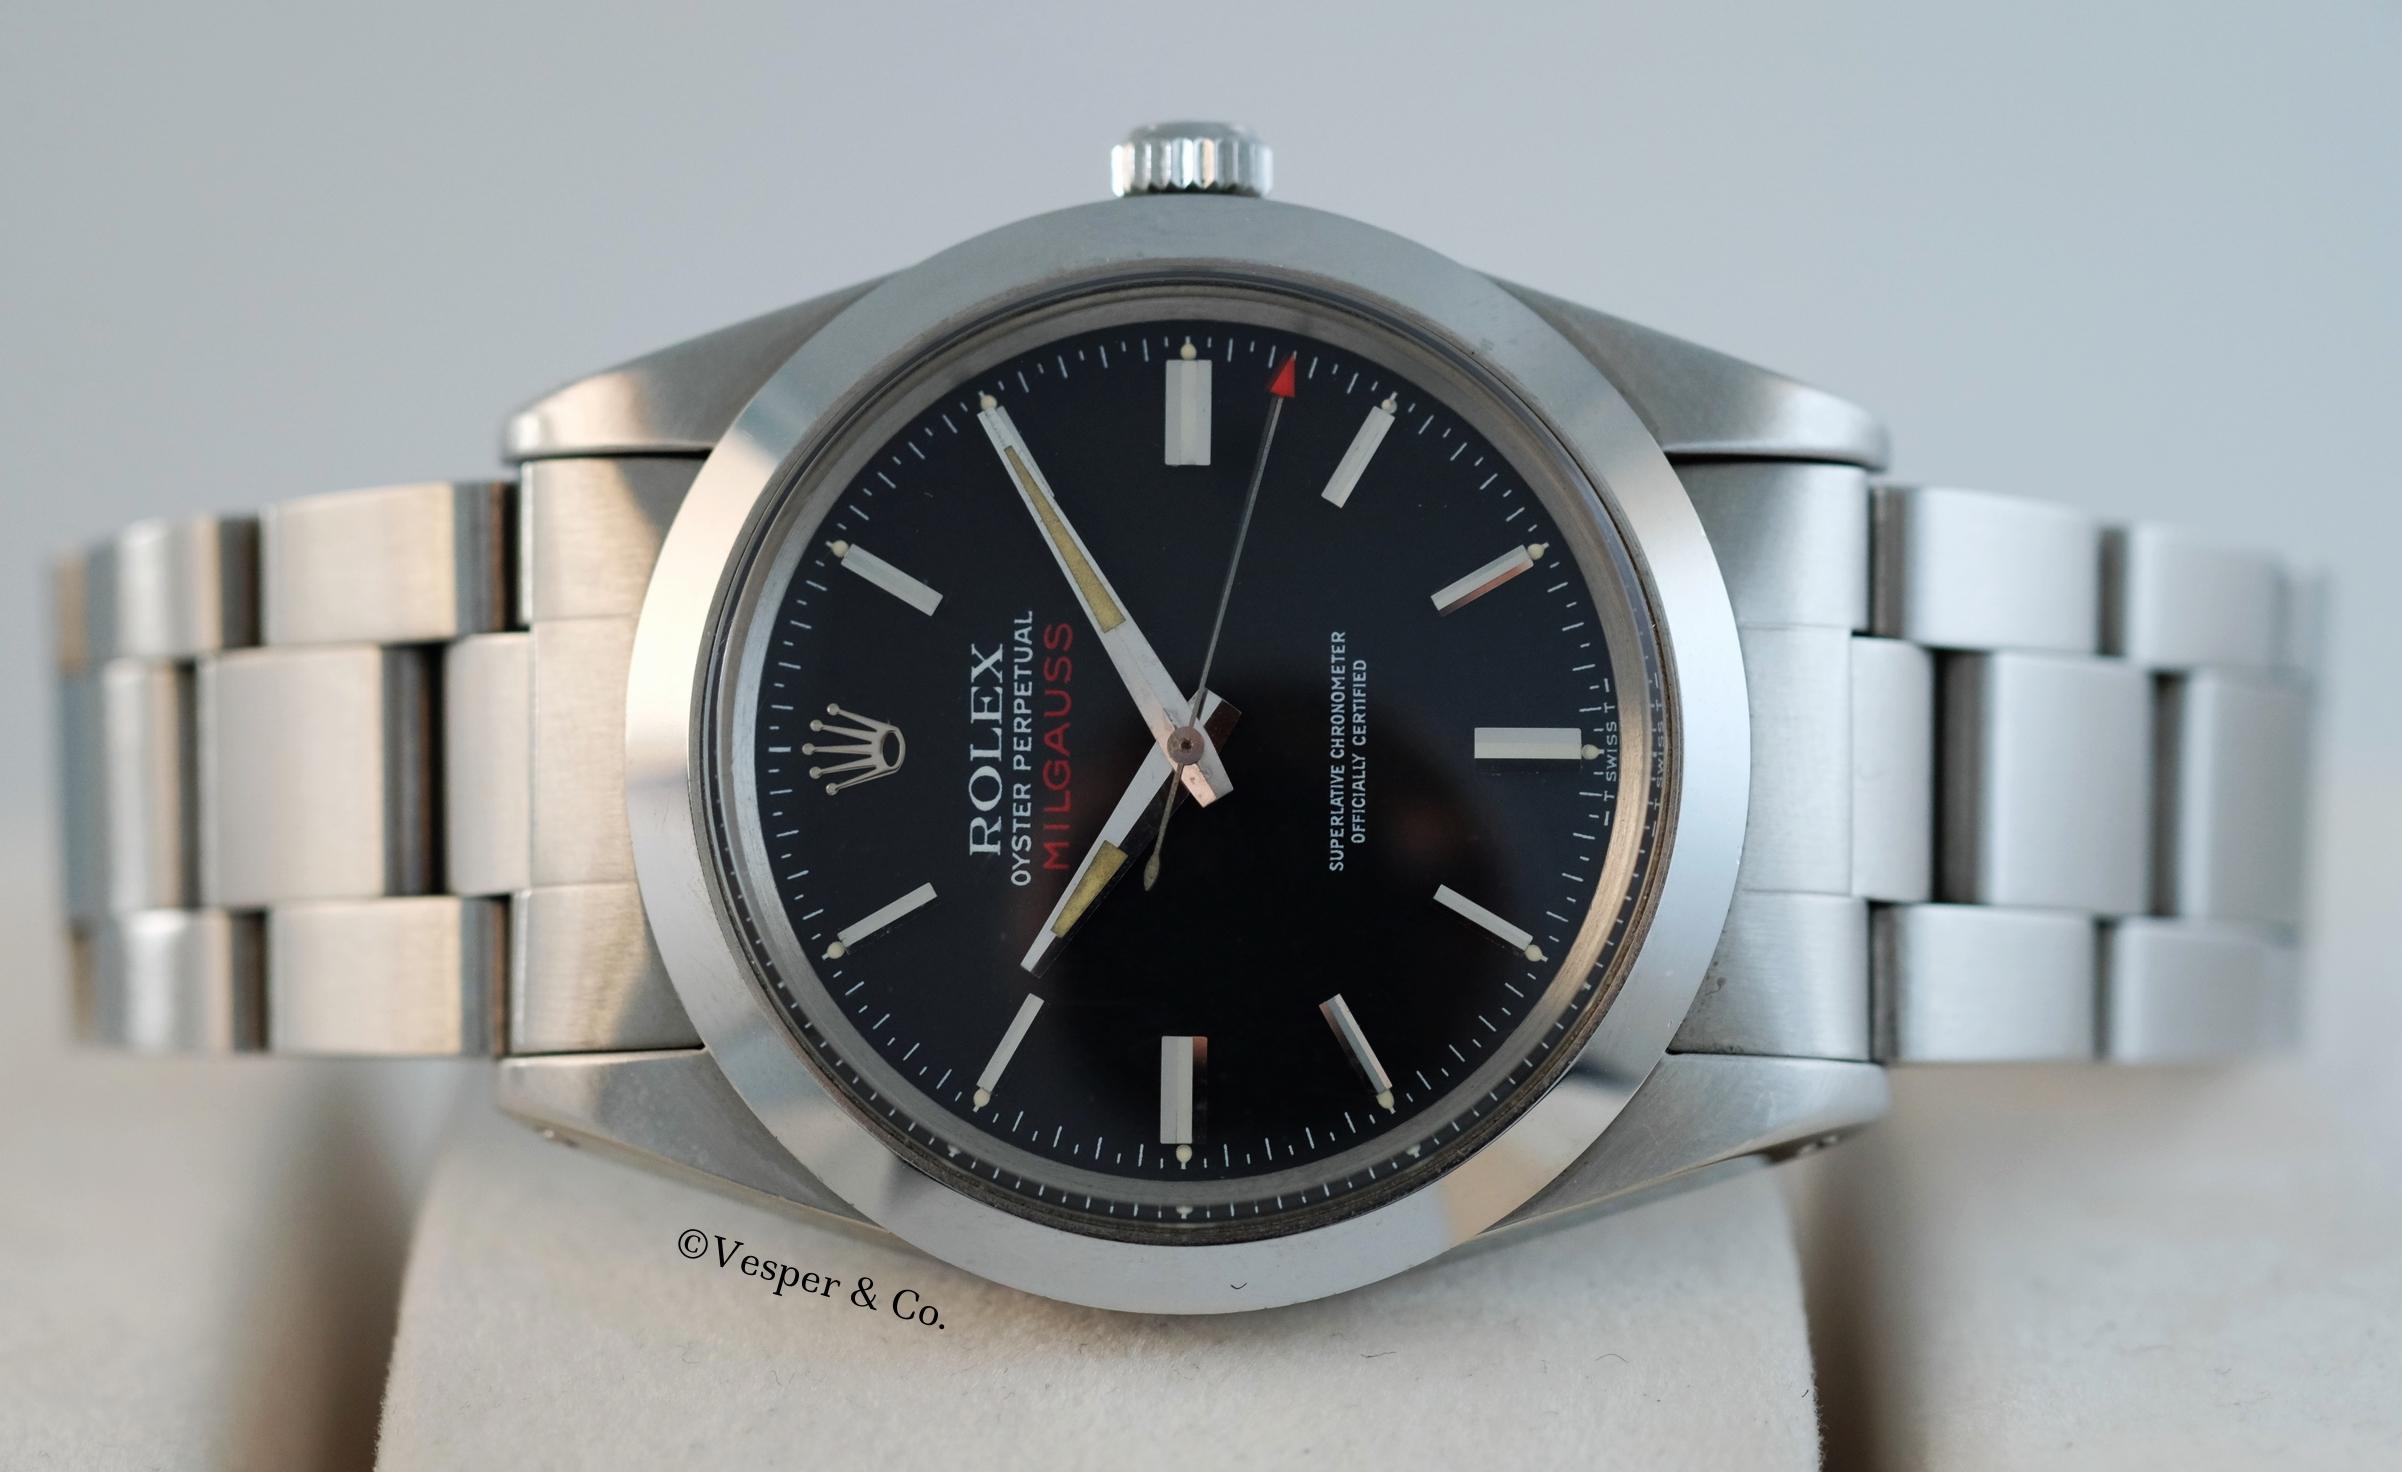 Rolex-milgauss-1019.jpg